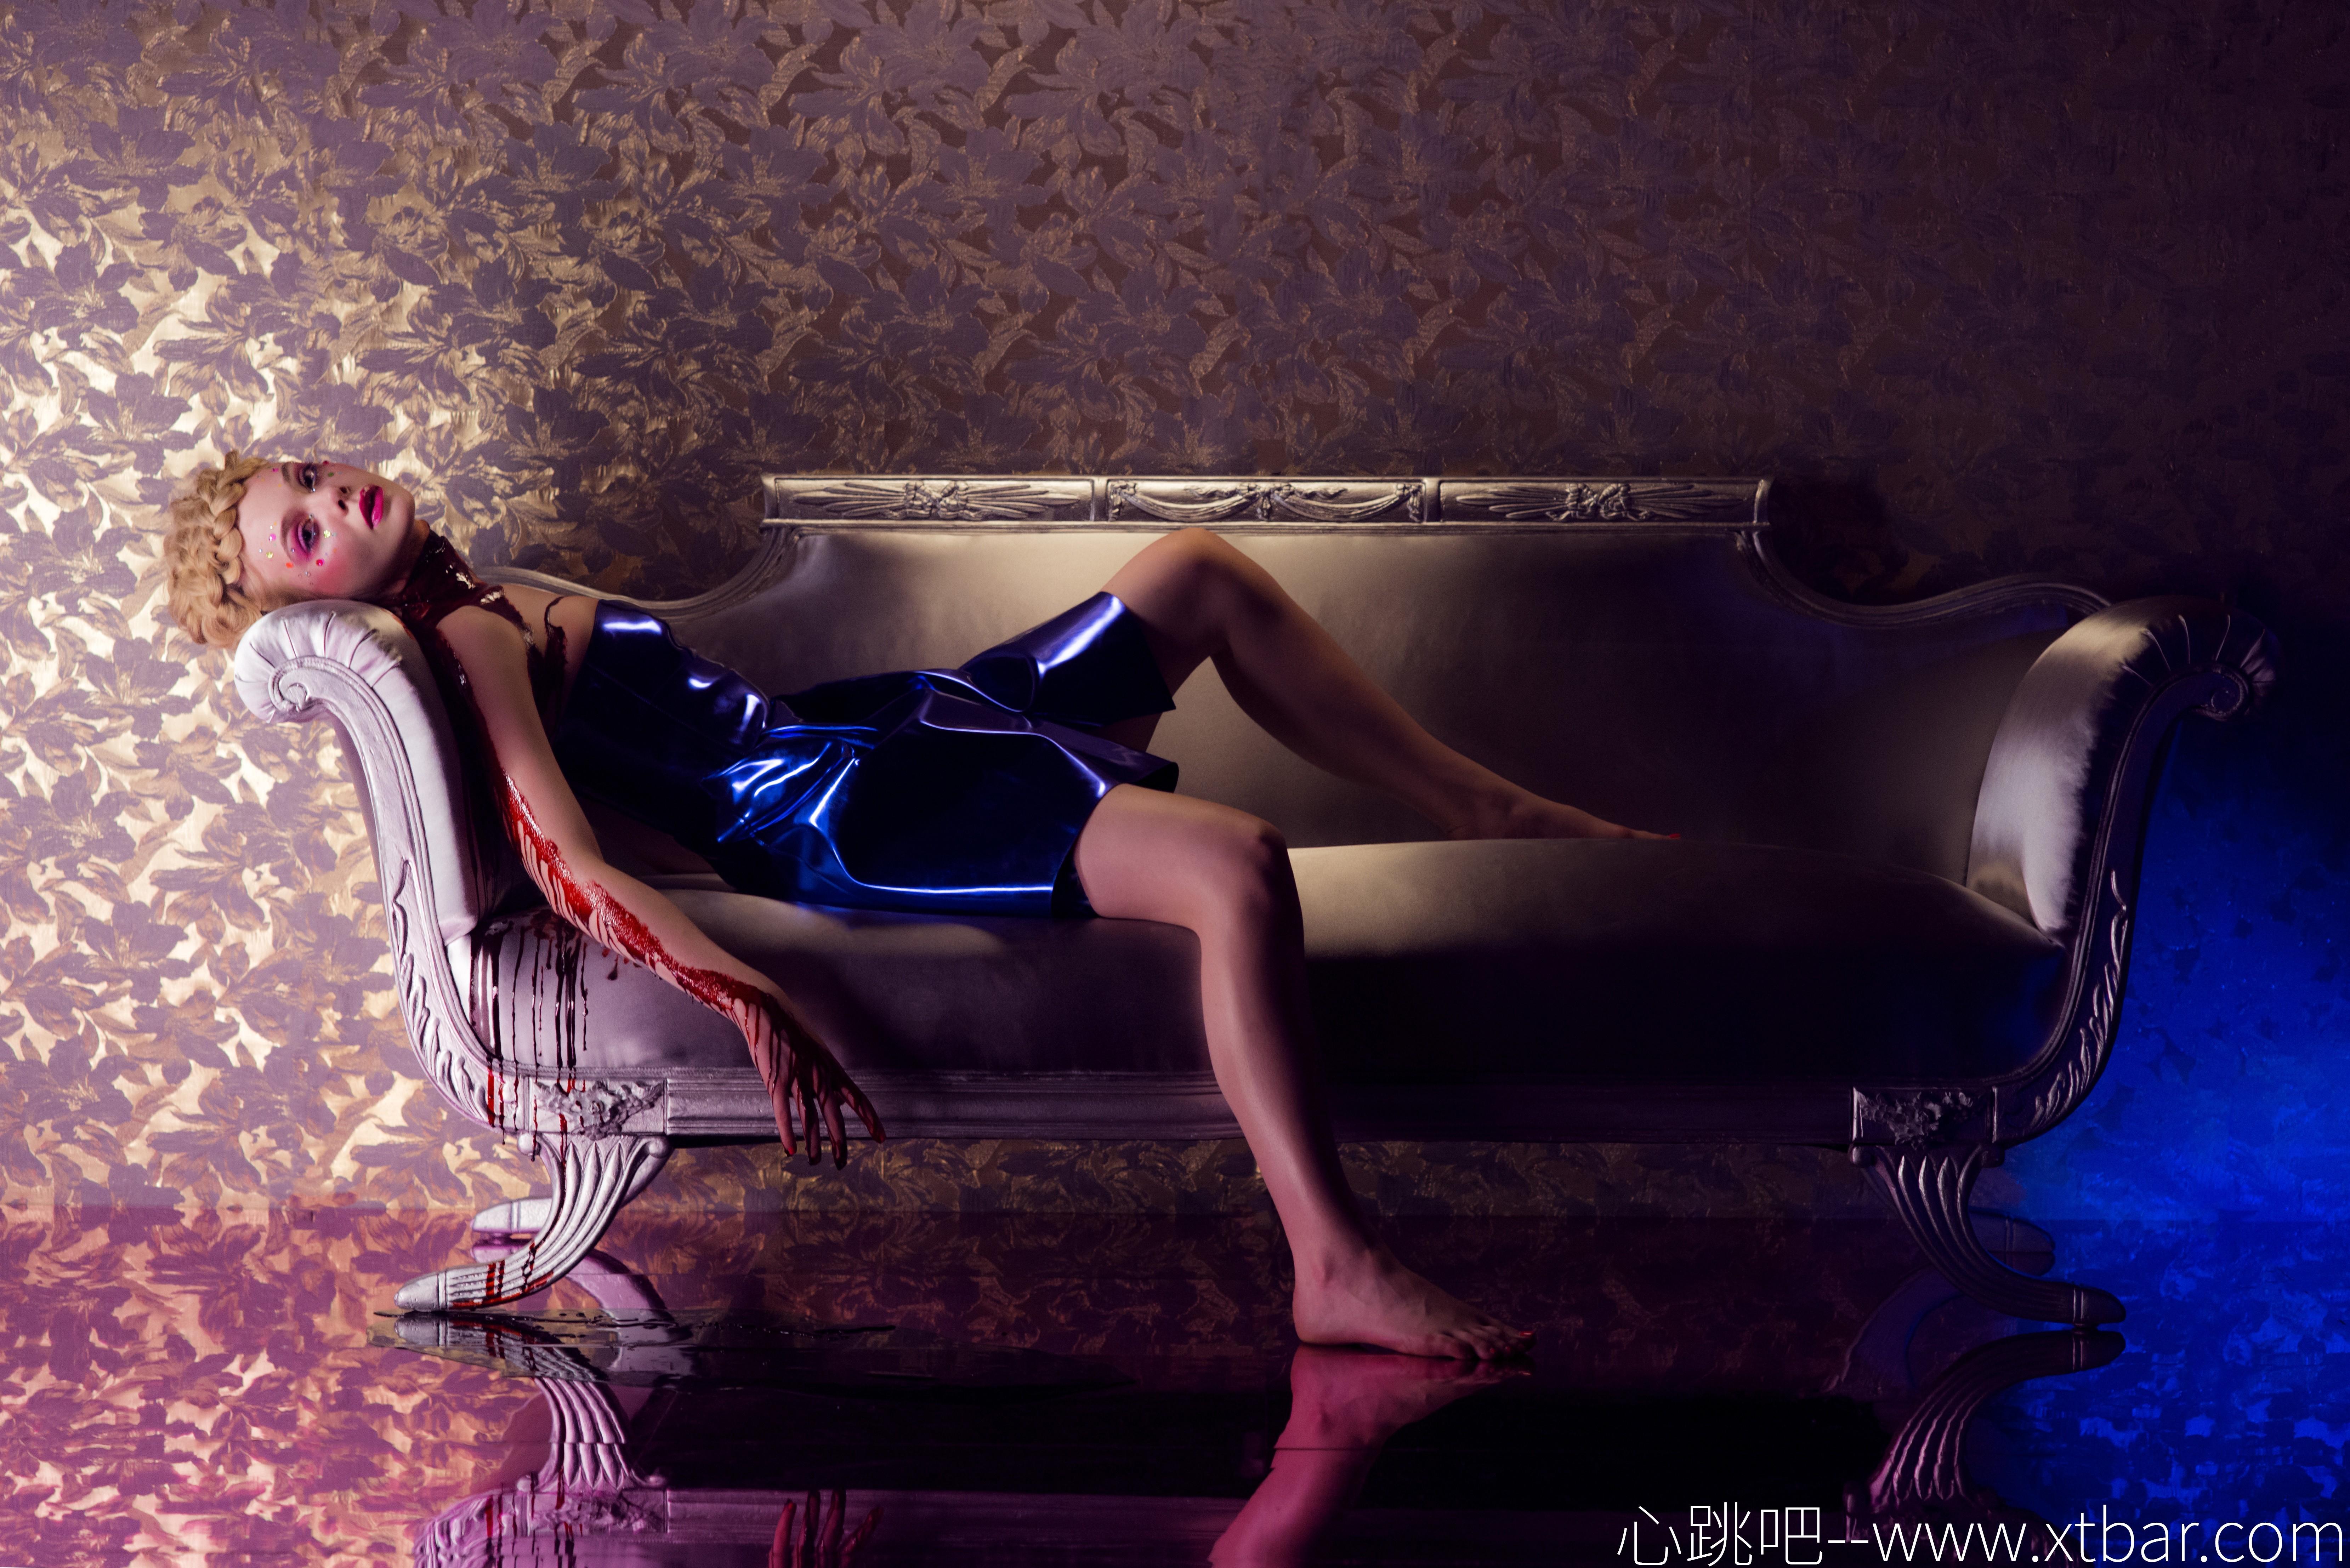 0085j6oIly1gmxnpgemq6j354c3f1e85 - [心跳吧恐怖片推荐]:《霓虹恶魔》,用极尽奢华的镜头掩盖单薄零碎的剧情